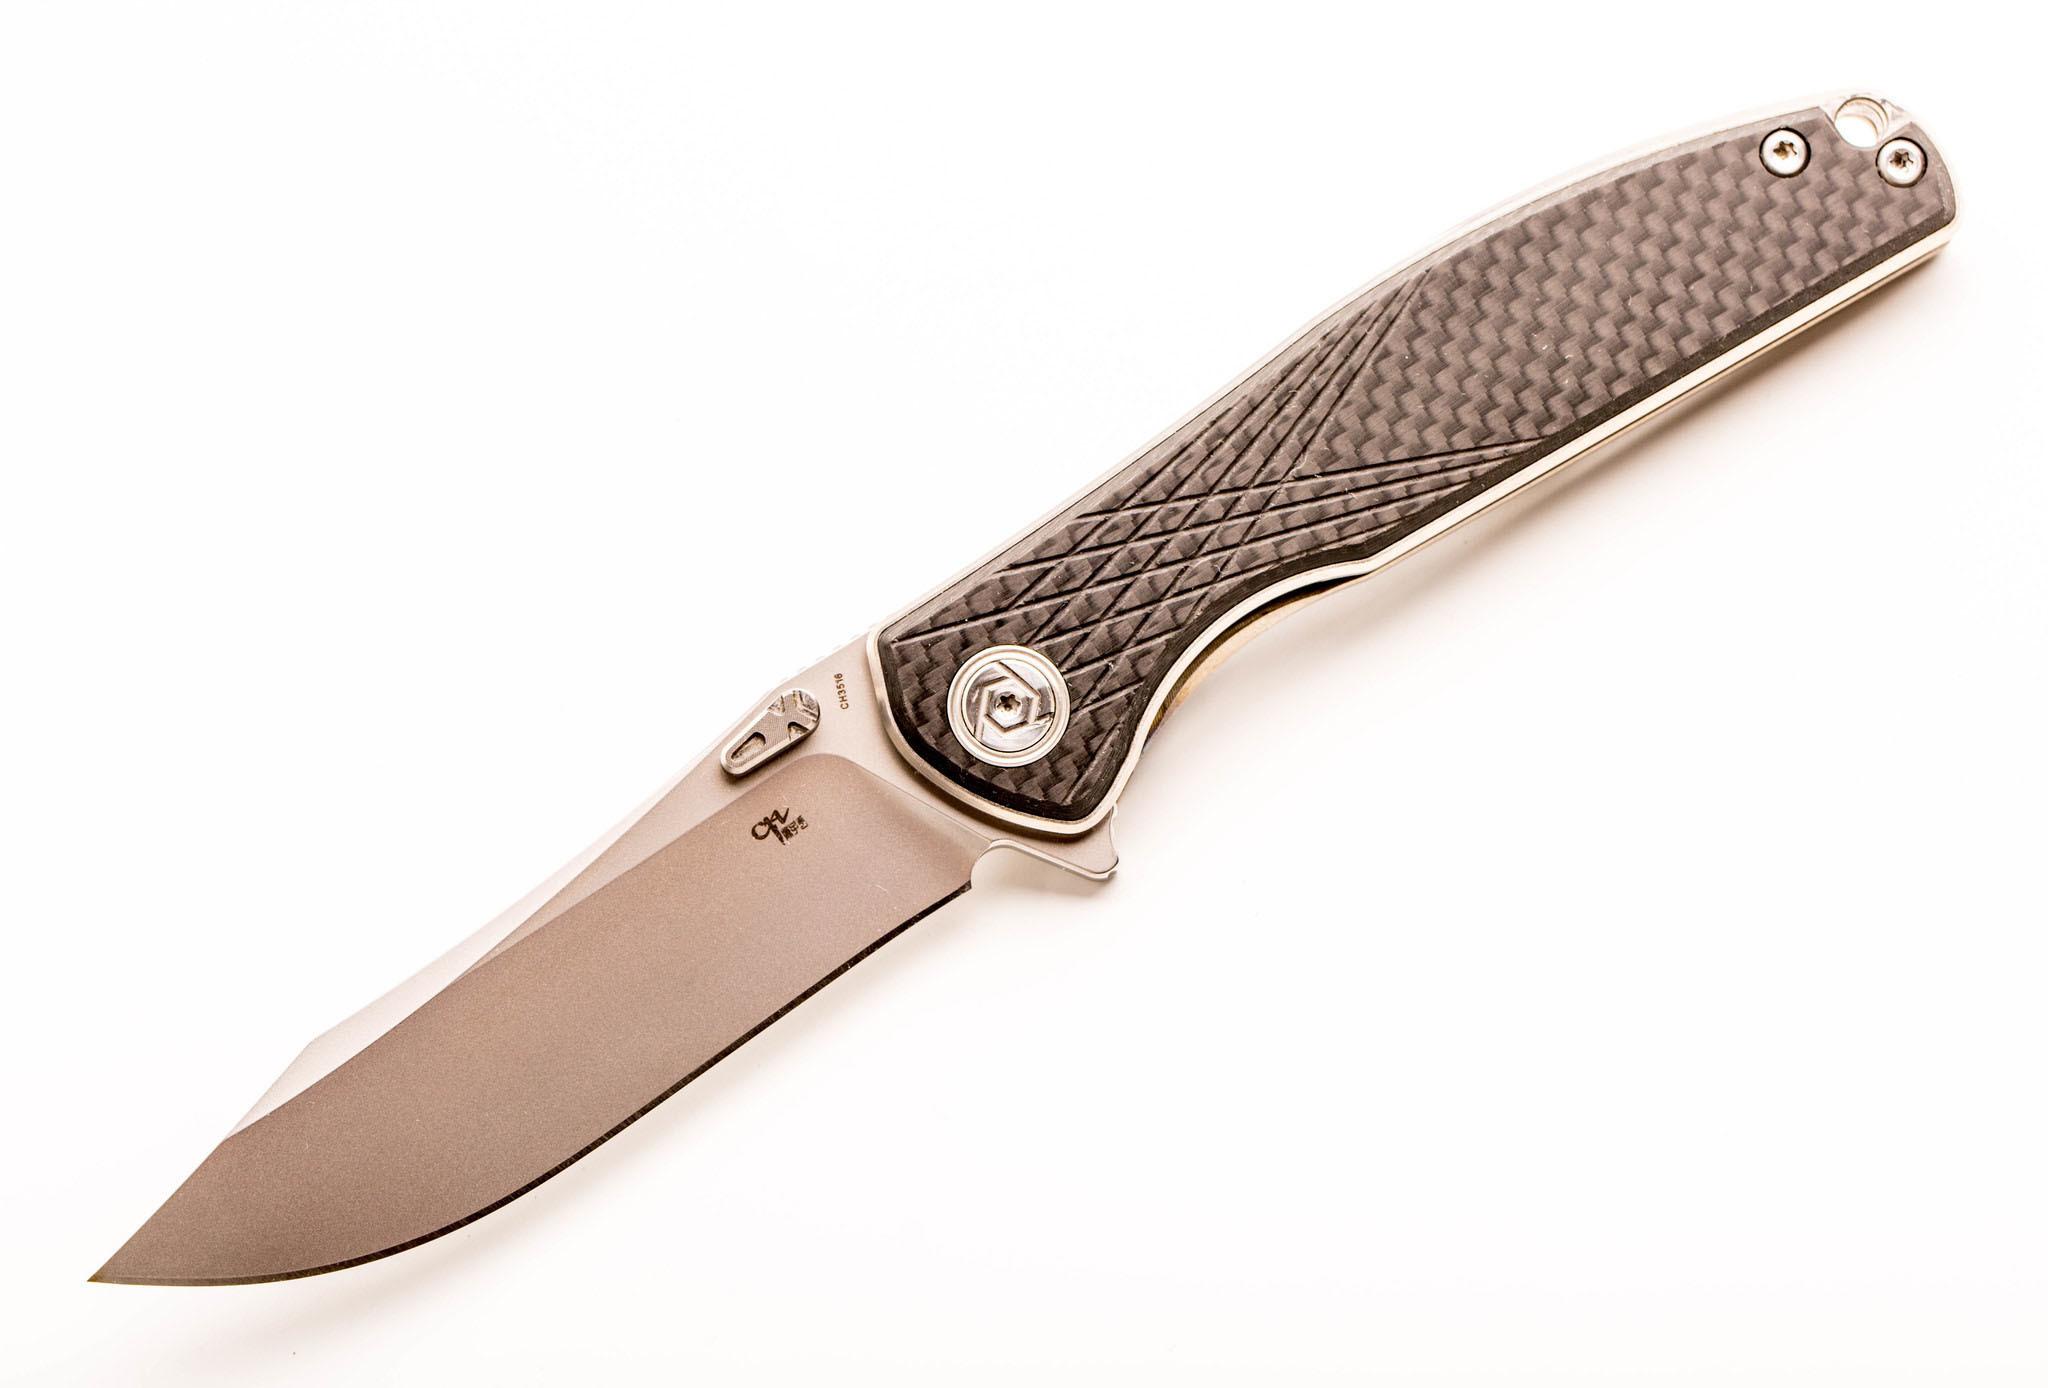 Складной нож CH3516, сталь S35VN (уценка)